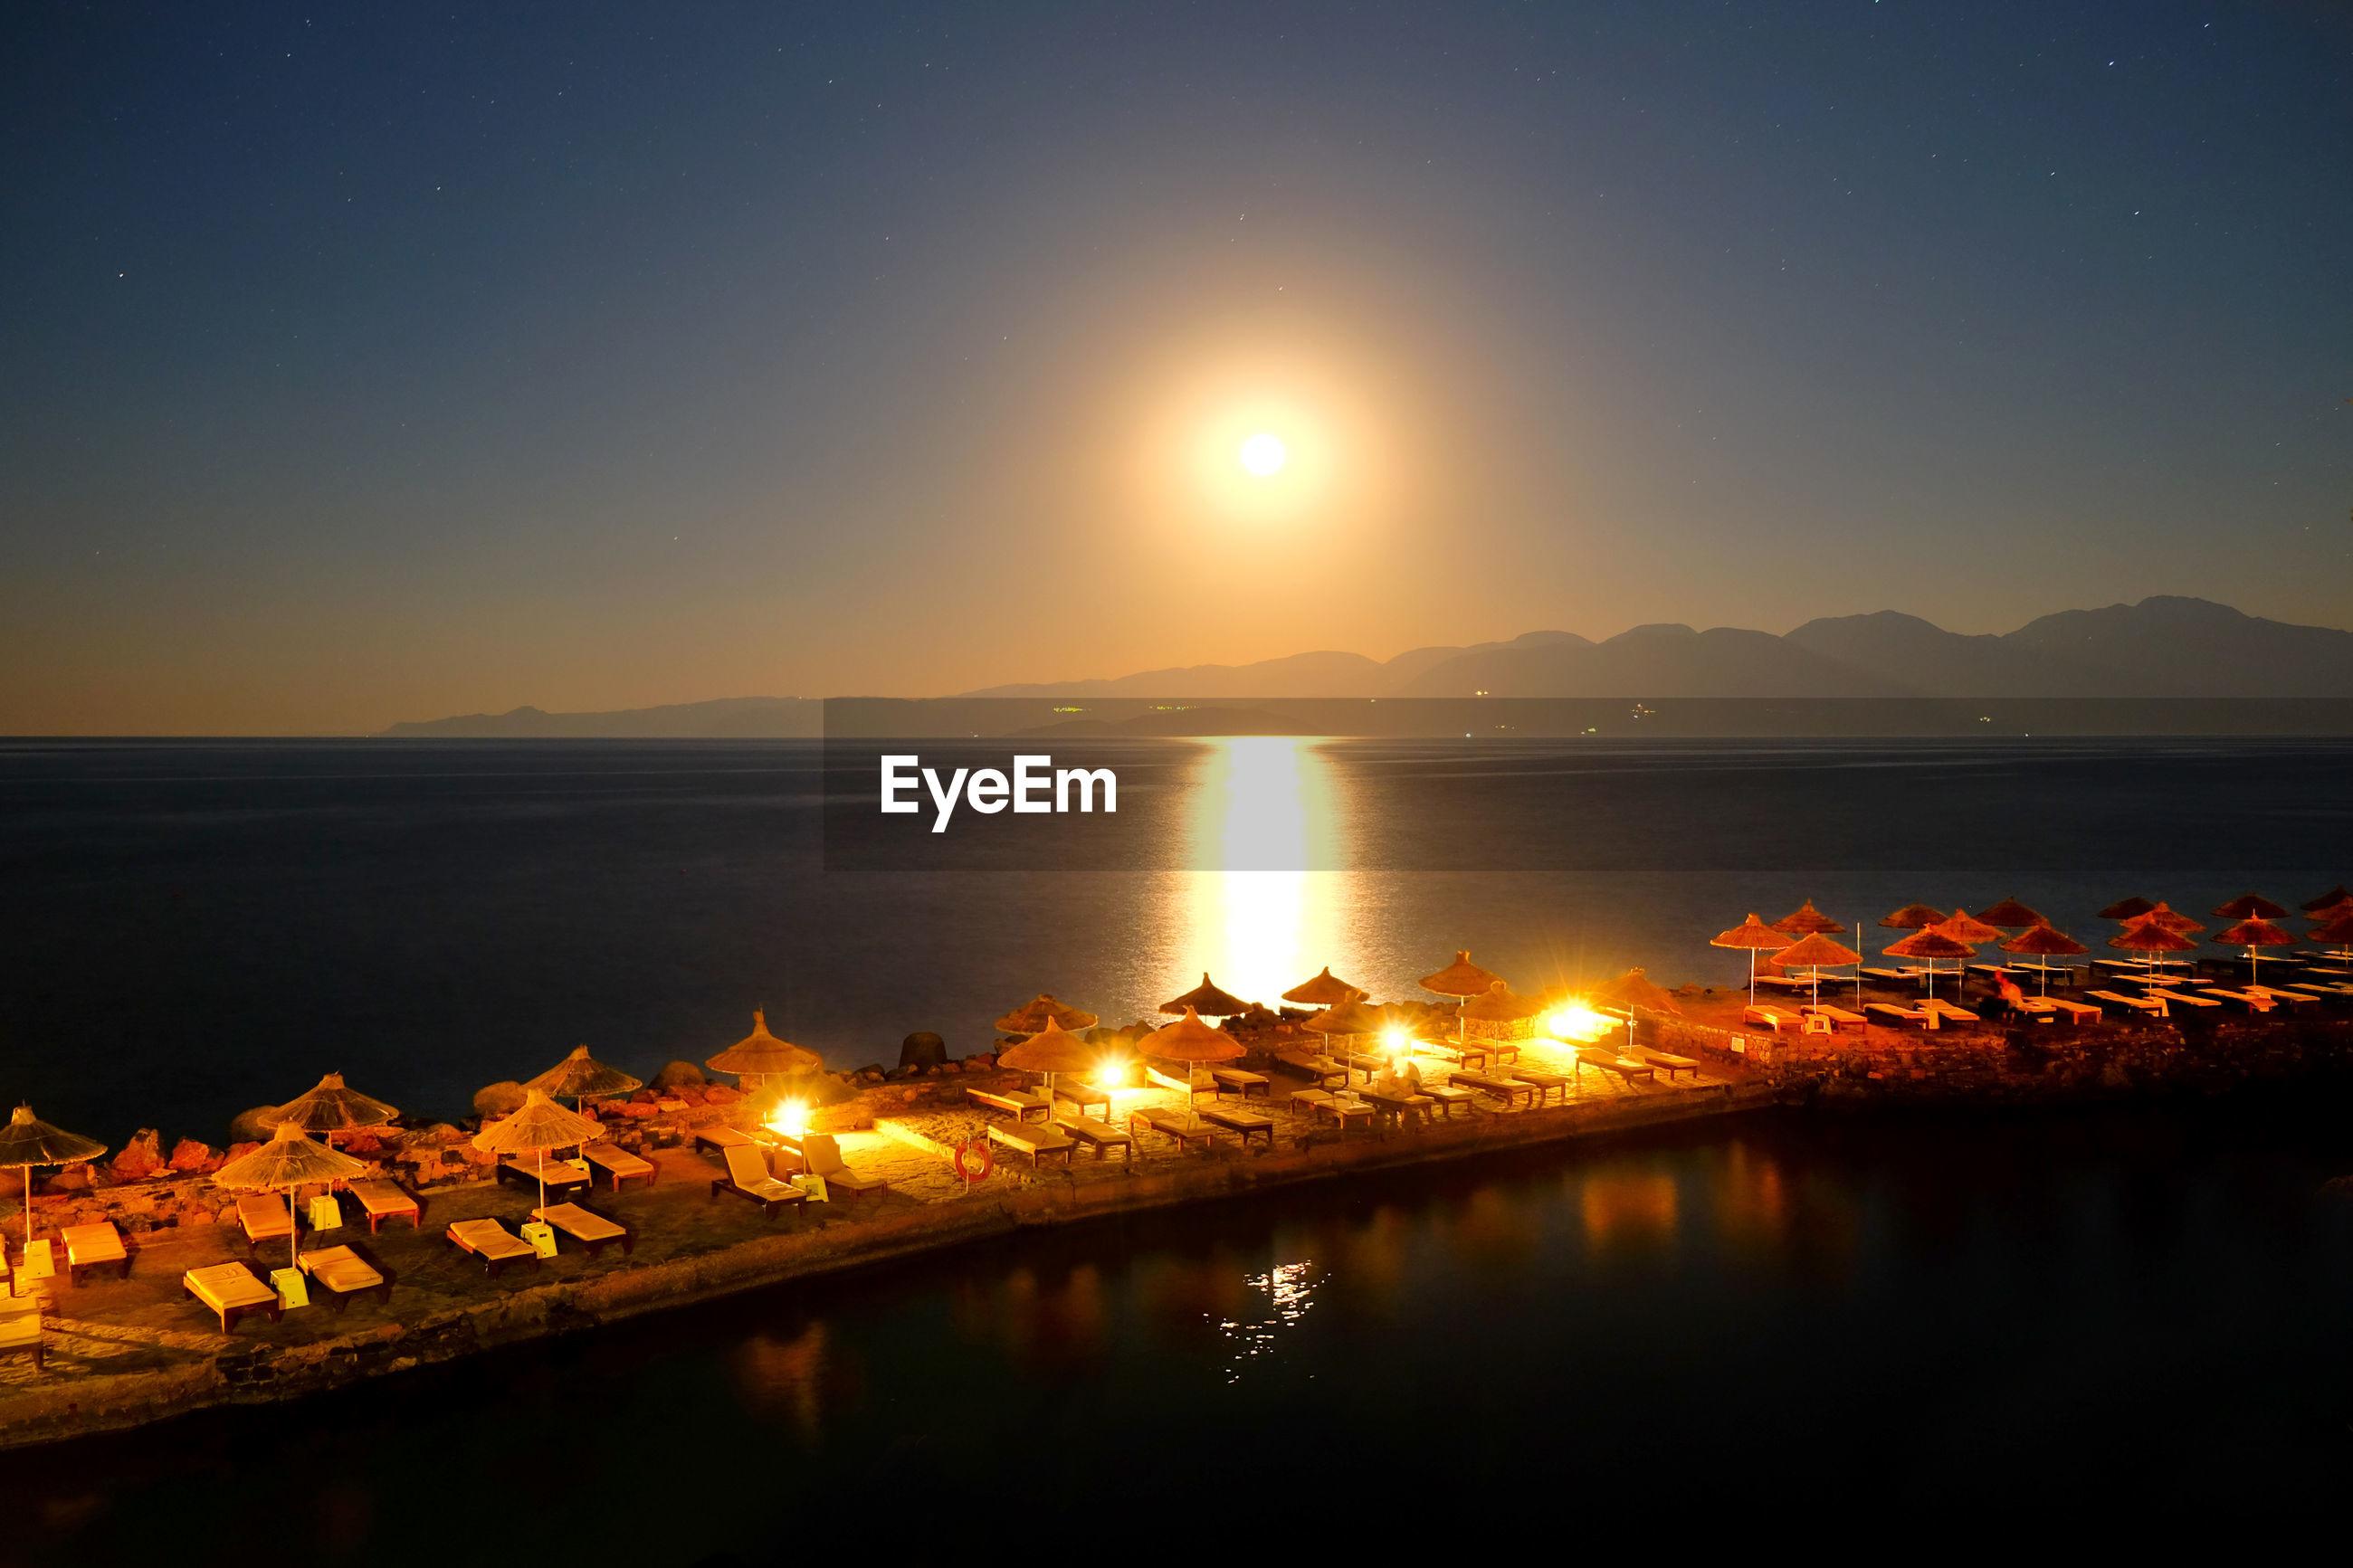 ILLUMINATED SEA AGAINST CLEAR SKY AT NIGHT